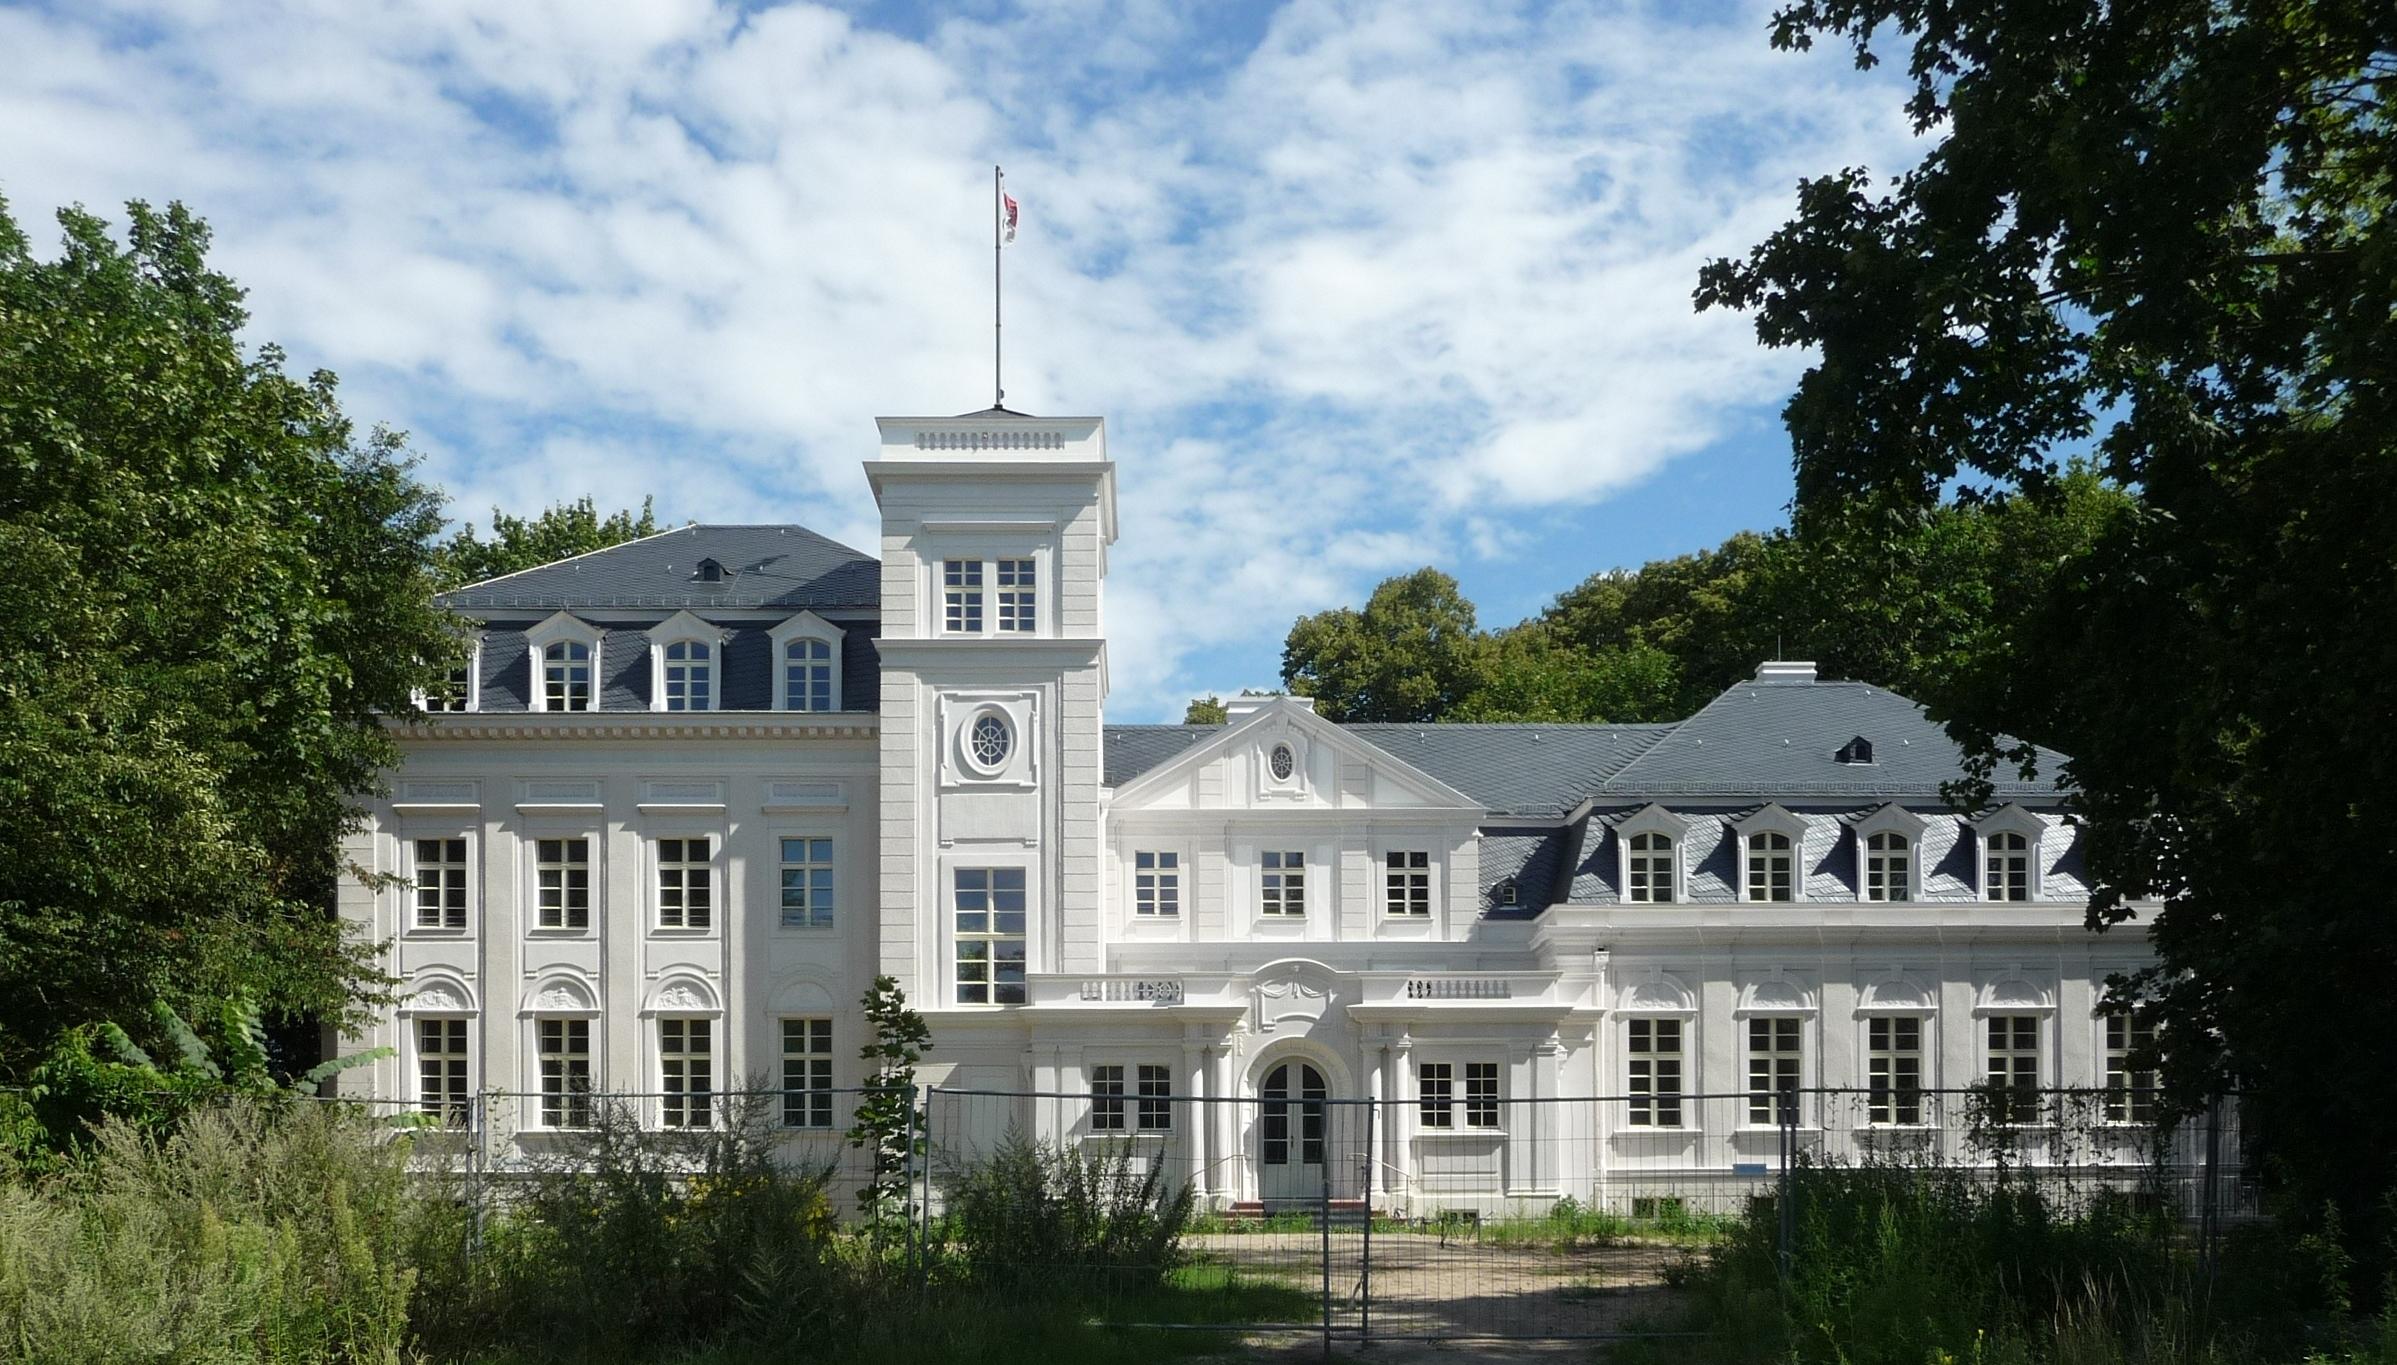 file villa carlshagen wikimedia commons. Black Bedroom Furniture Sets. Home Design Ideas